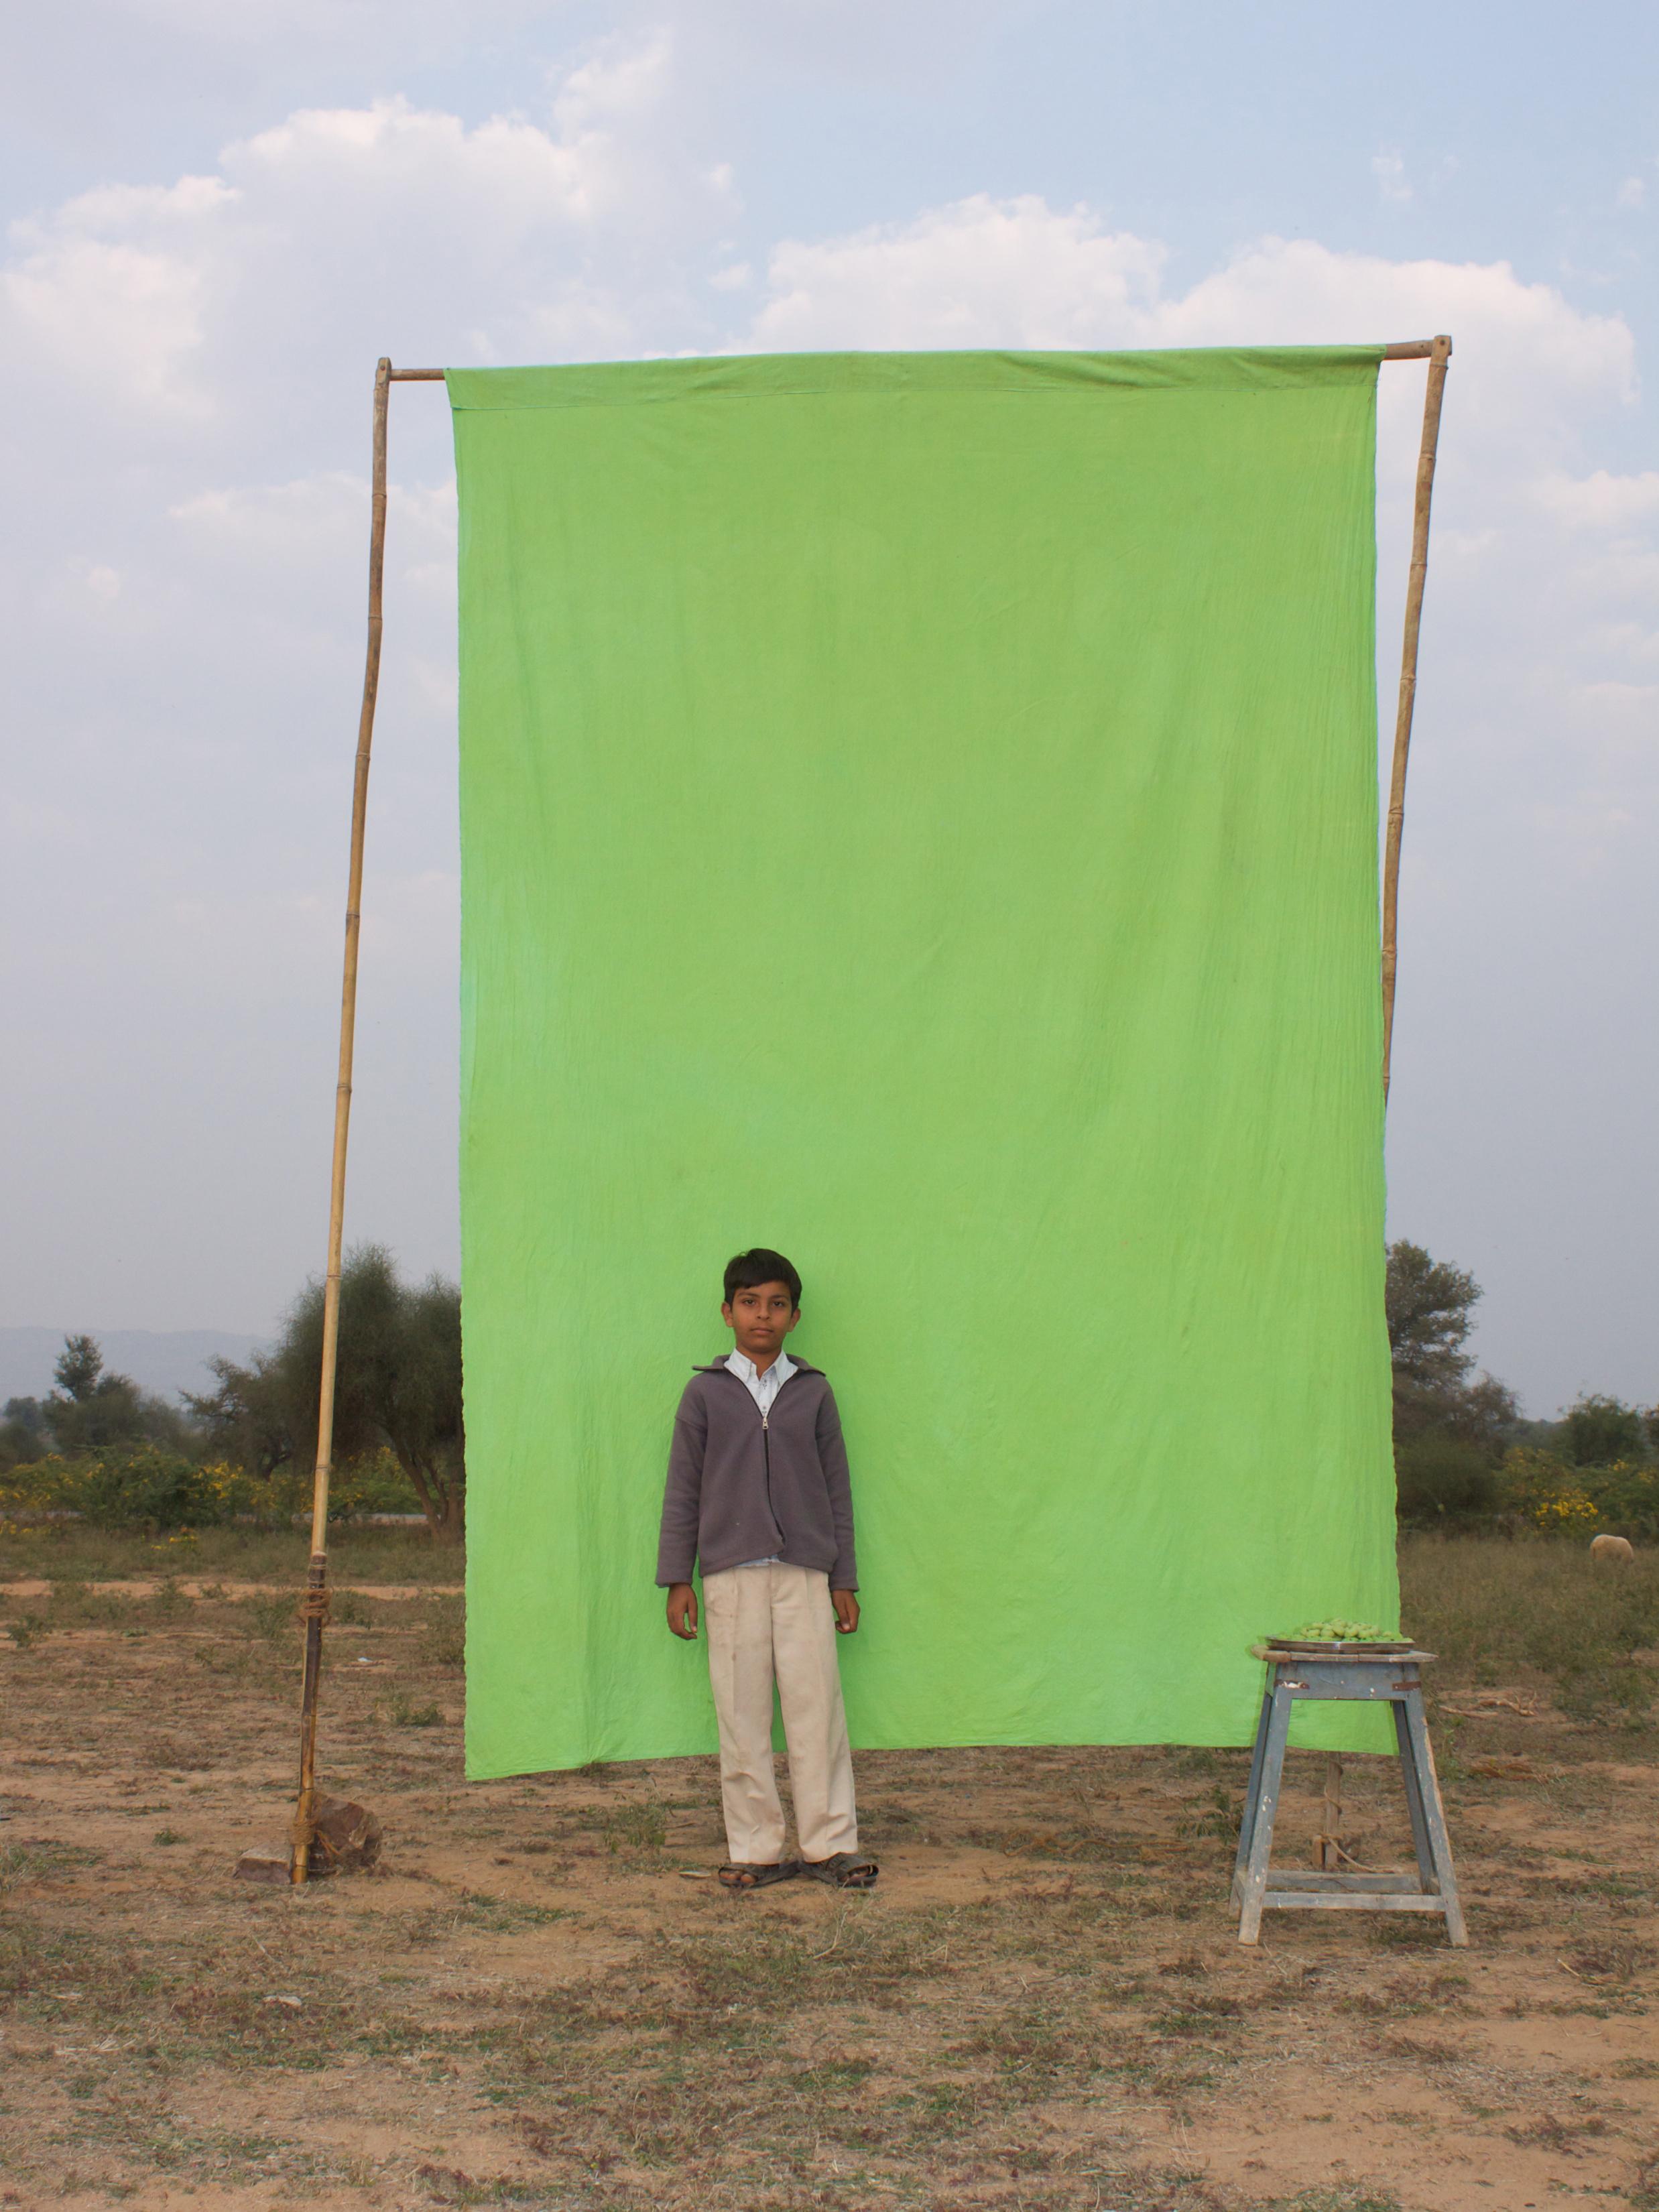 Benjamin Faga    Chroma Green No. 19    C-print    30 x 40 inches